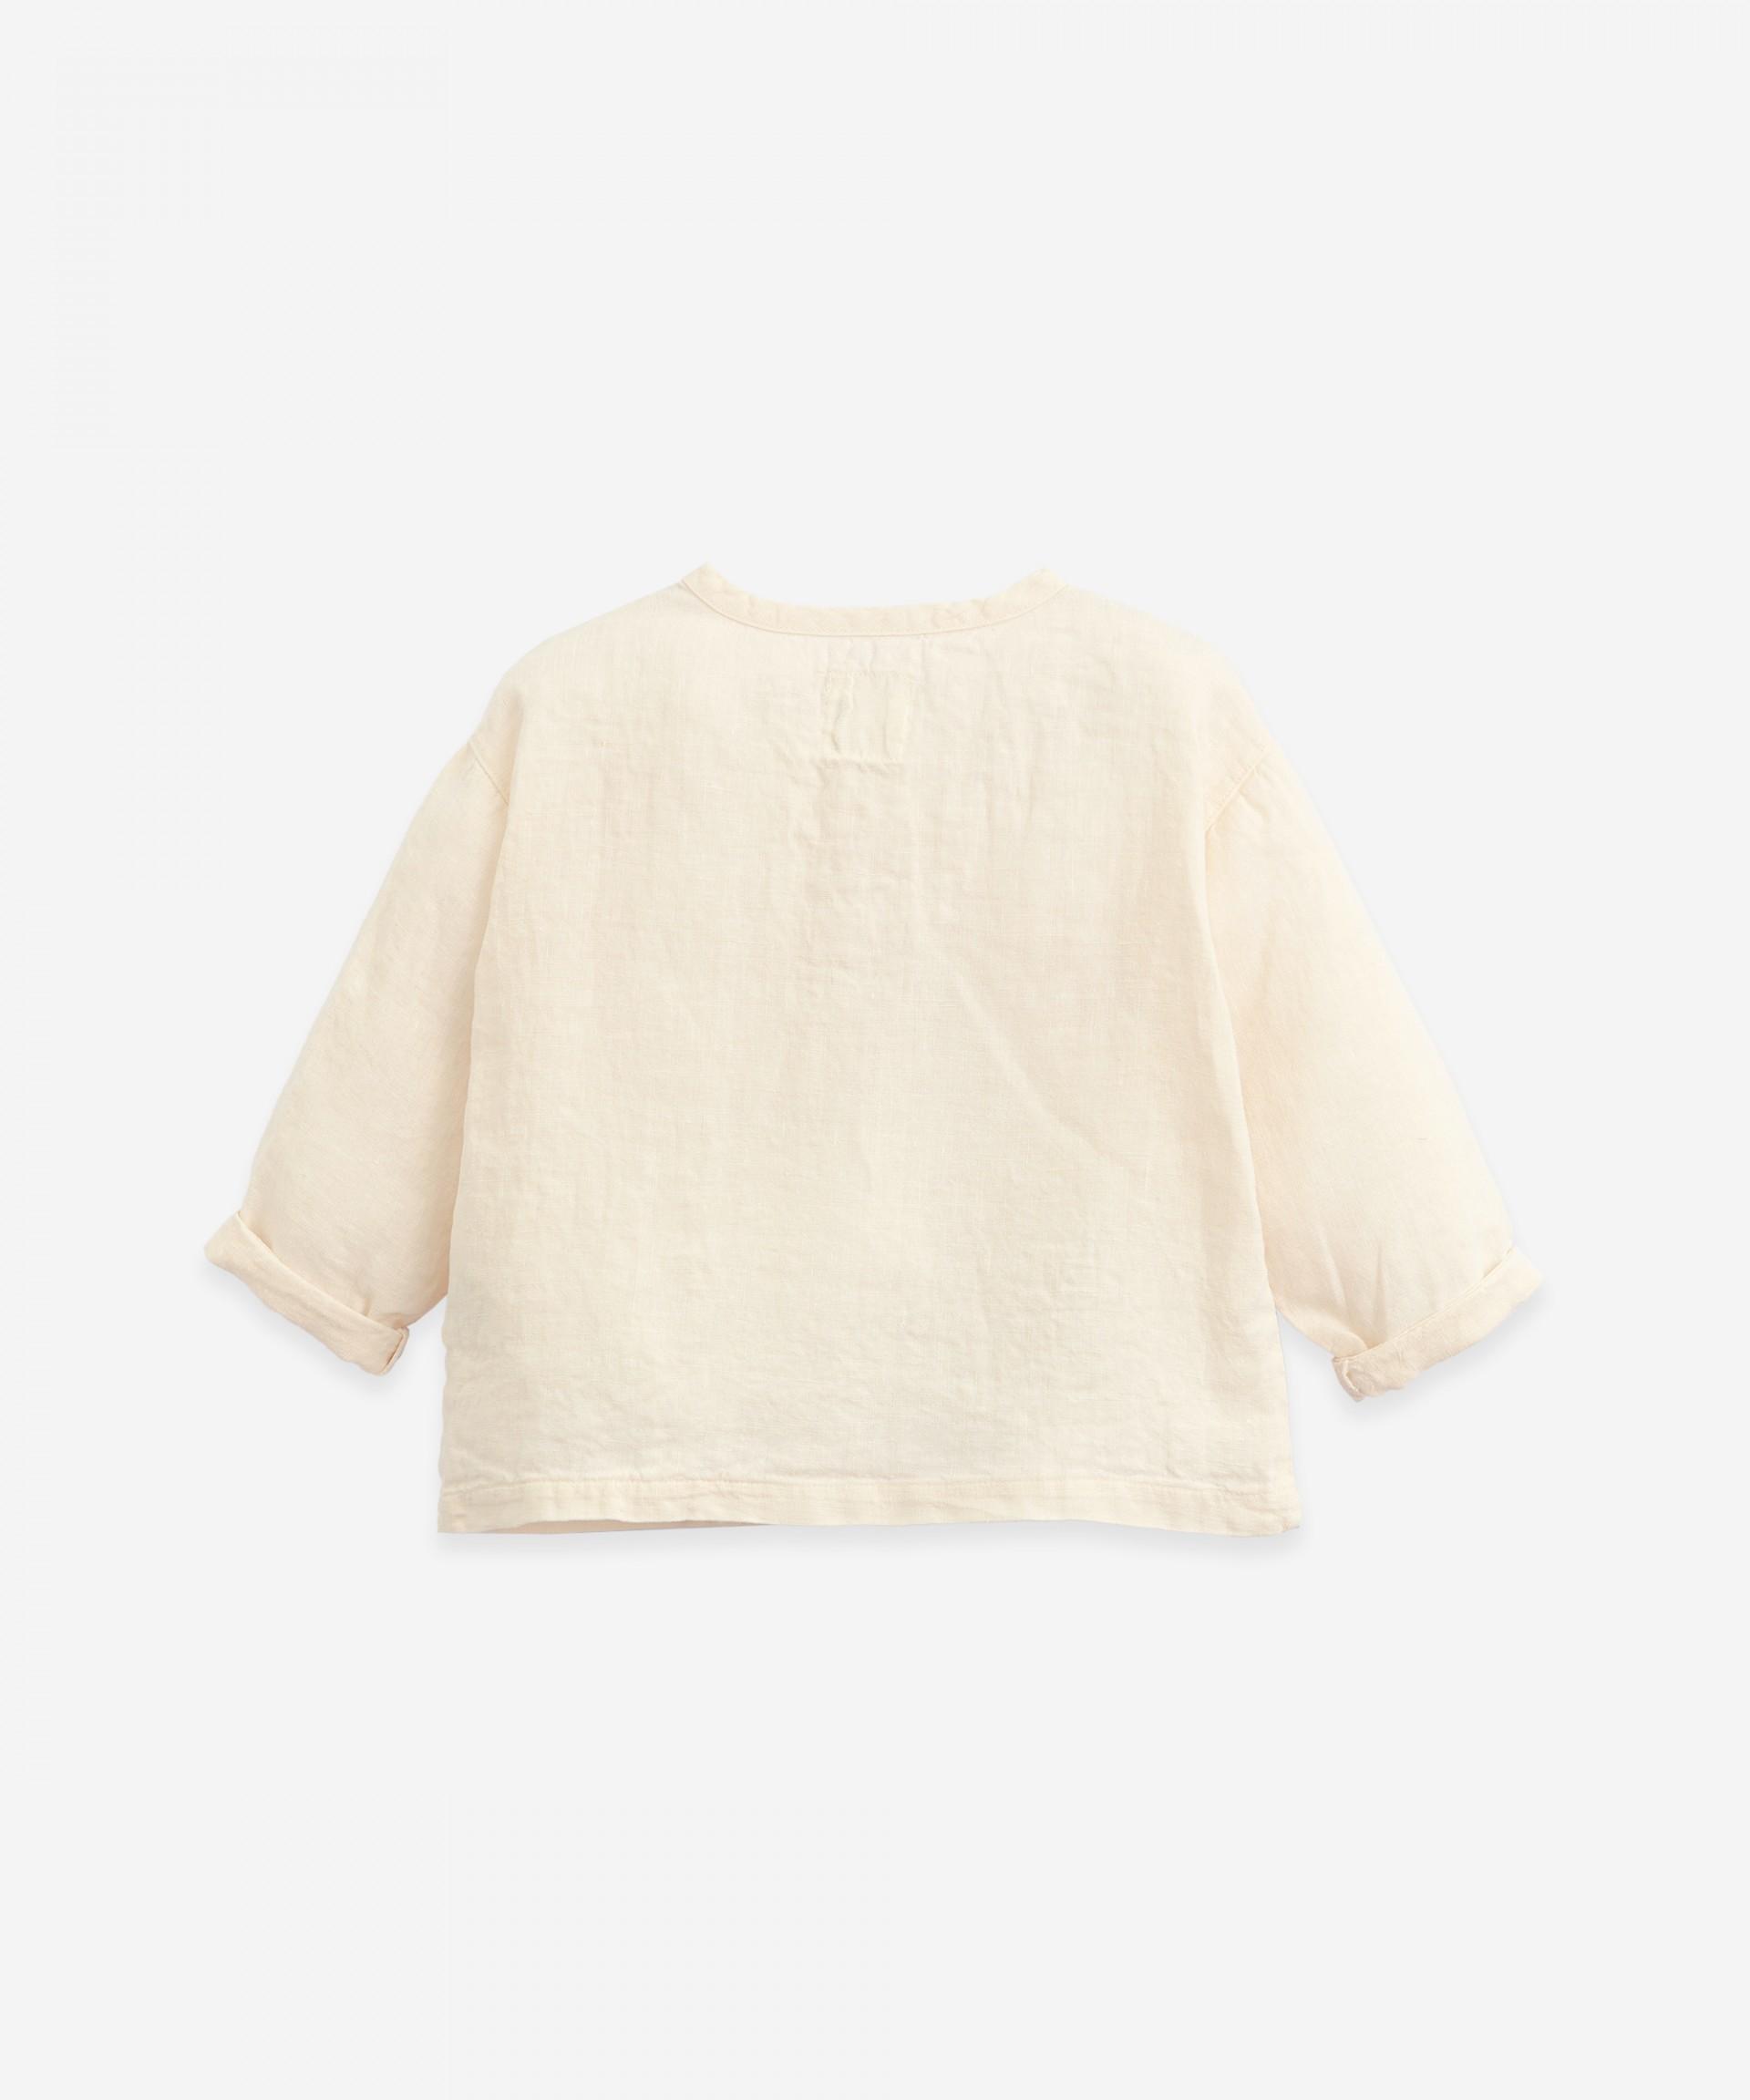 Linen shirt with pocket   Botany